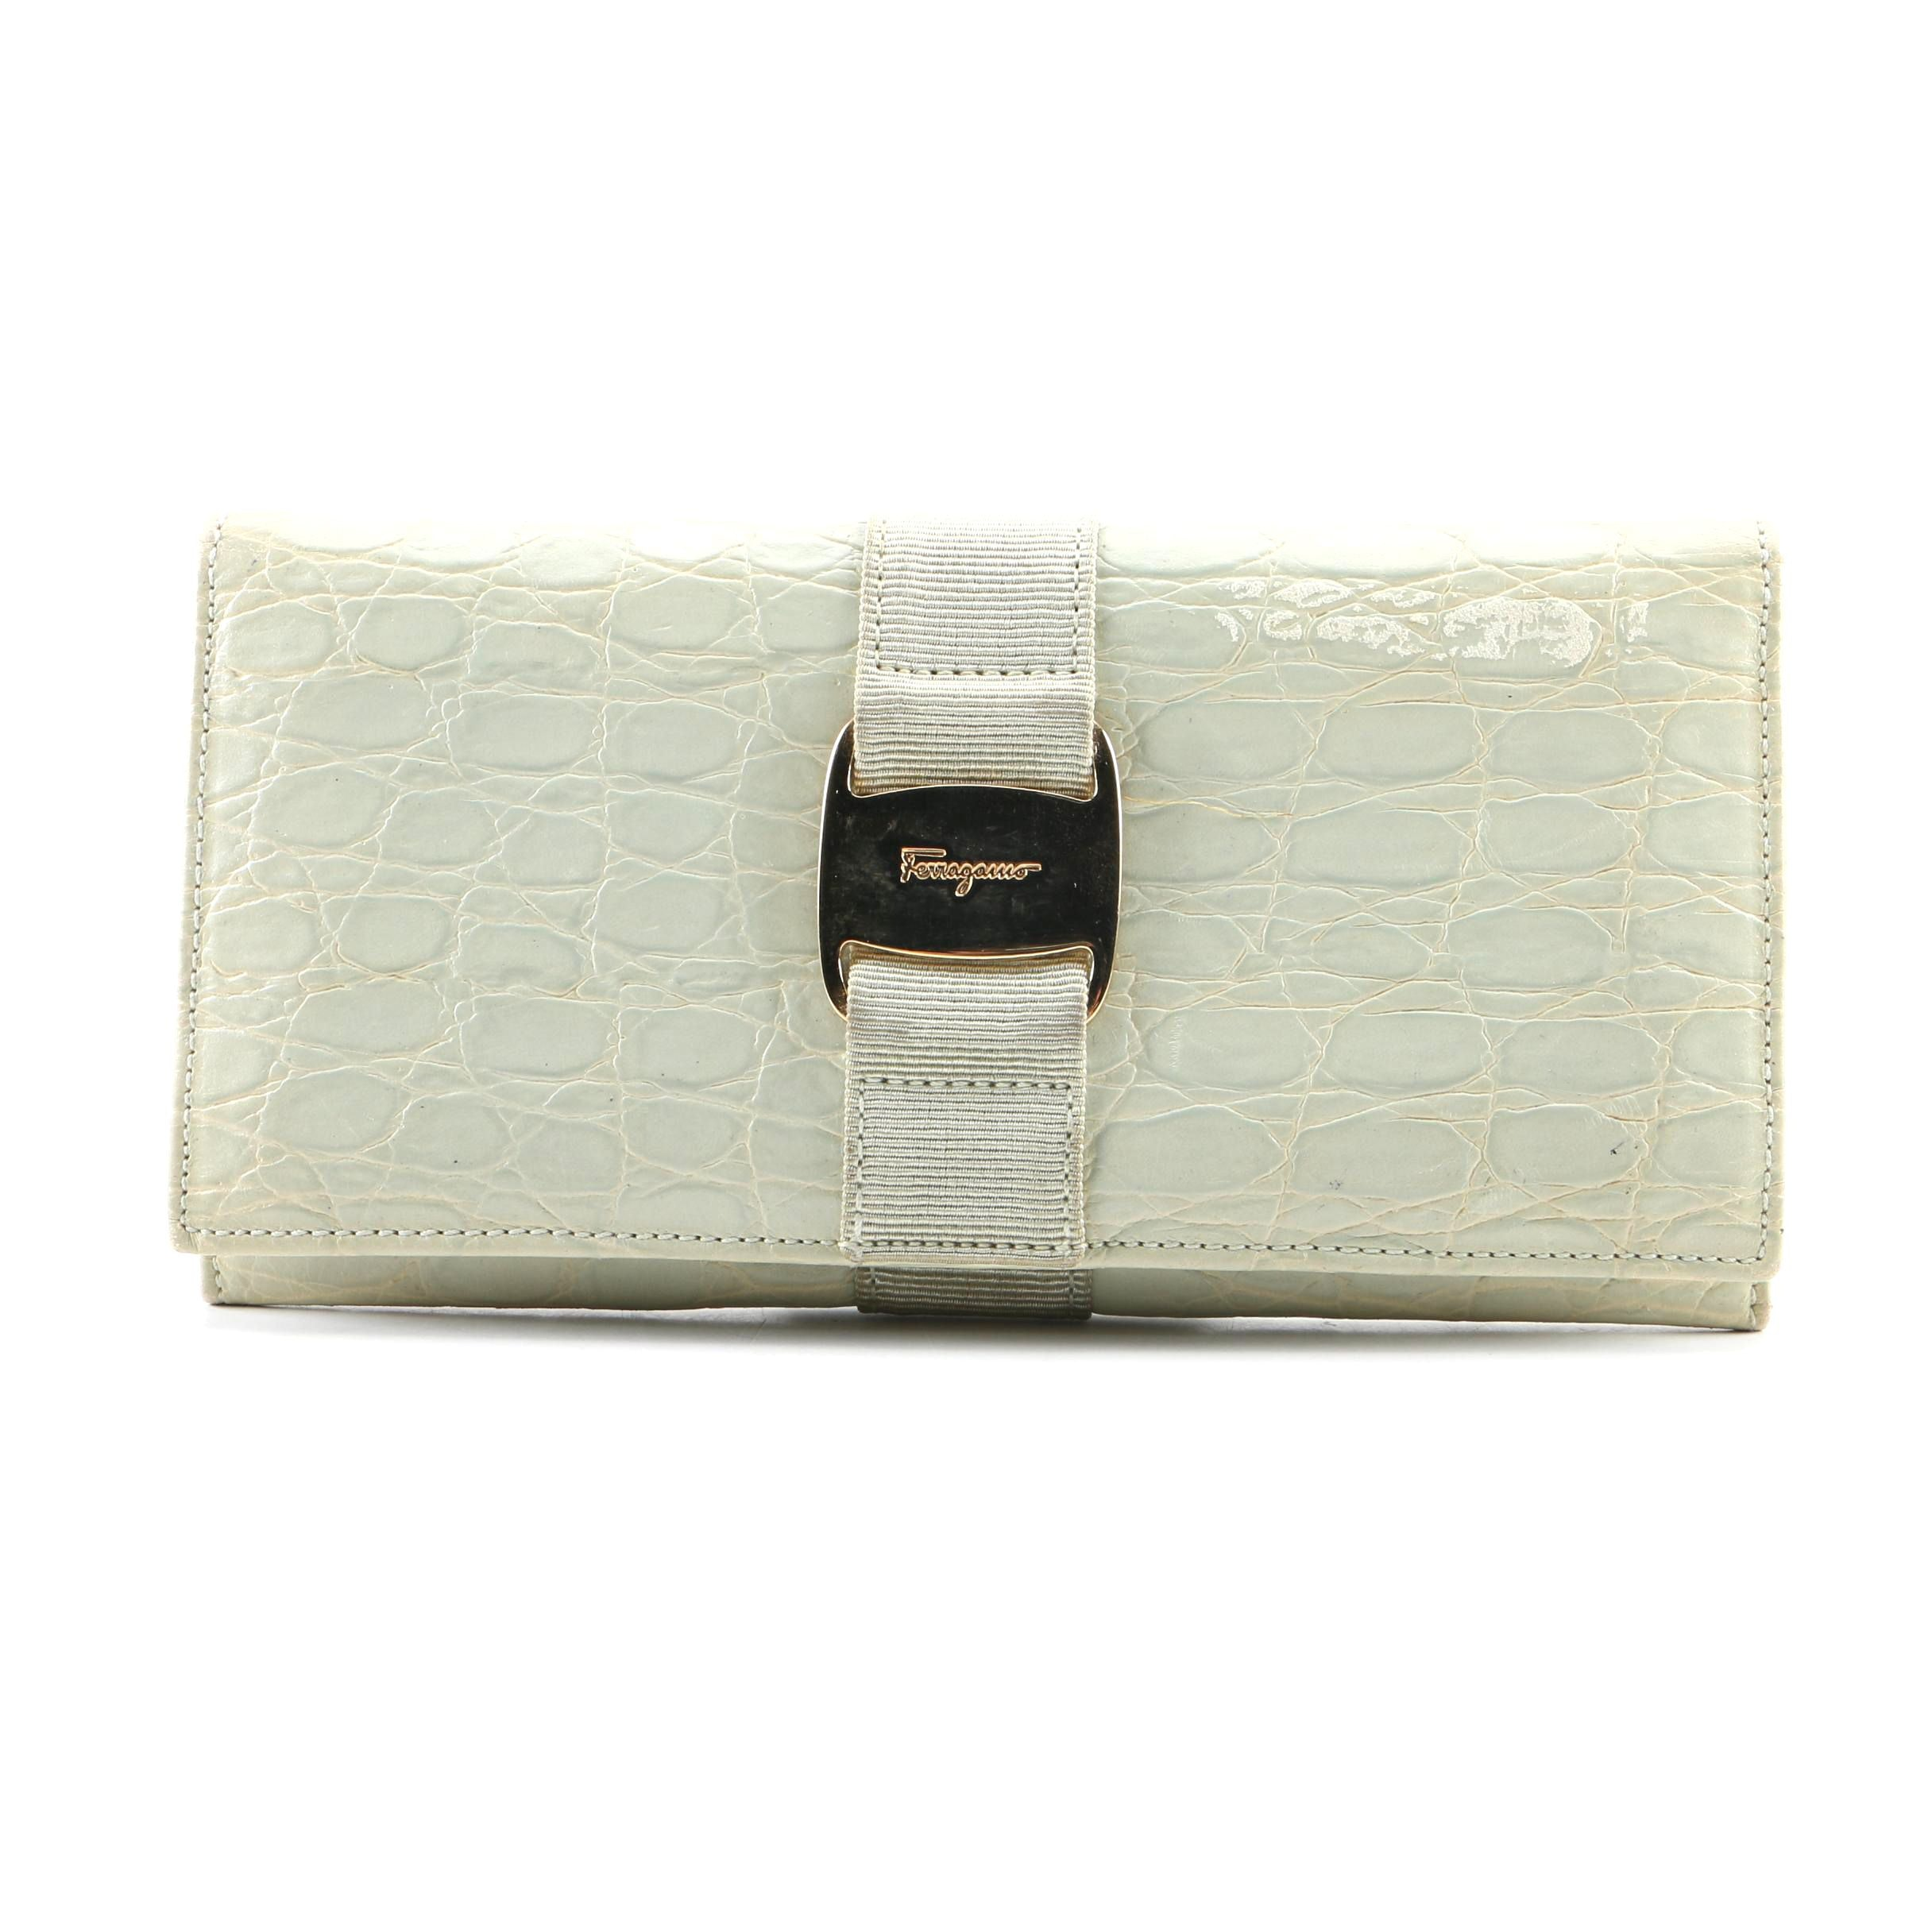 Vintage Salvatore Ferragamo Embossed Light Green Leather Wallet